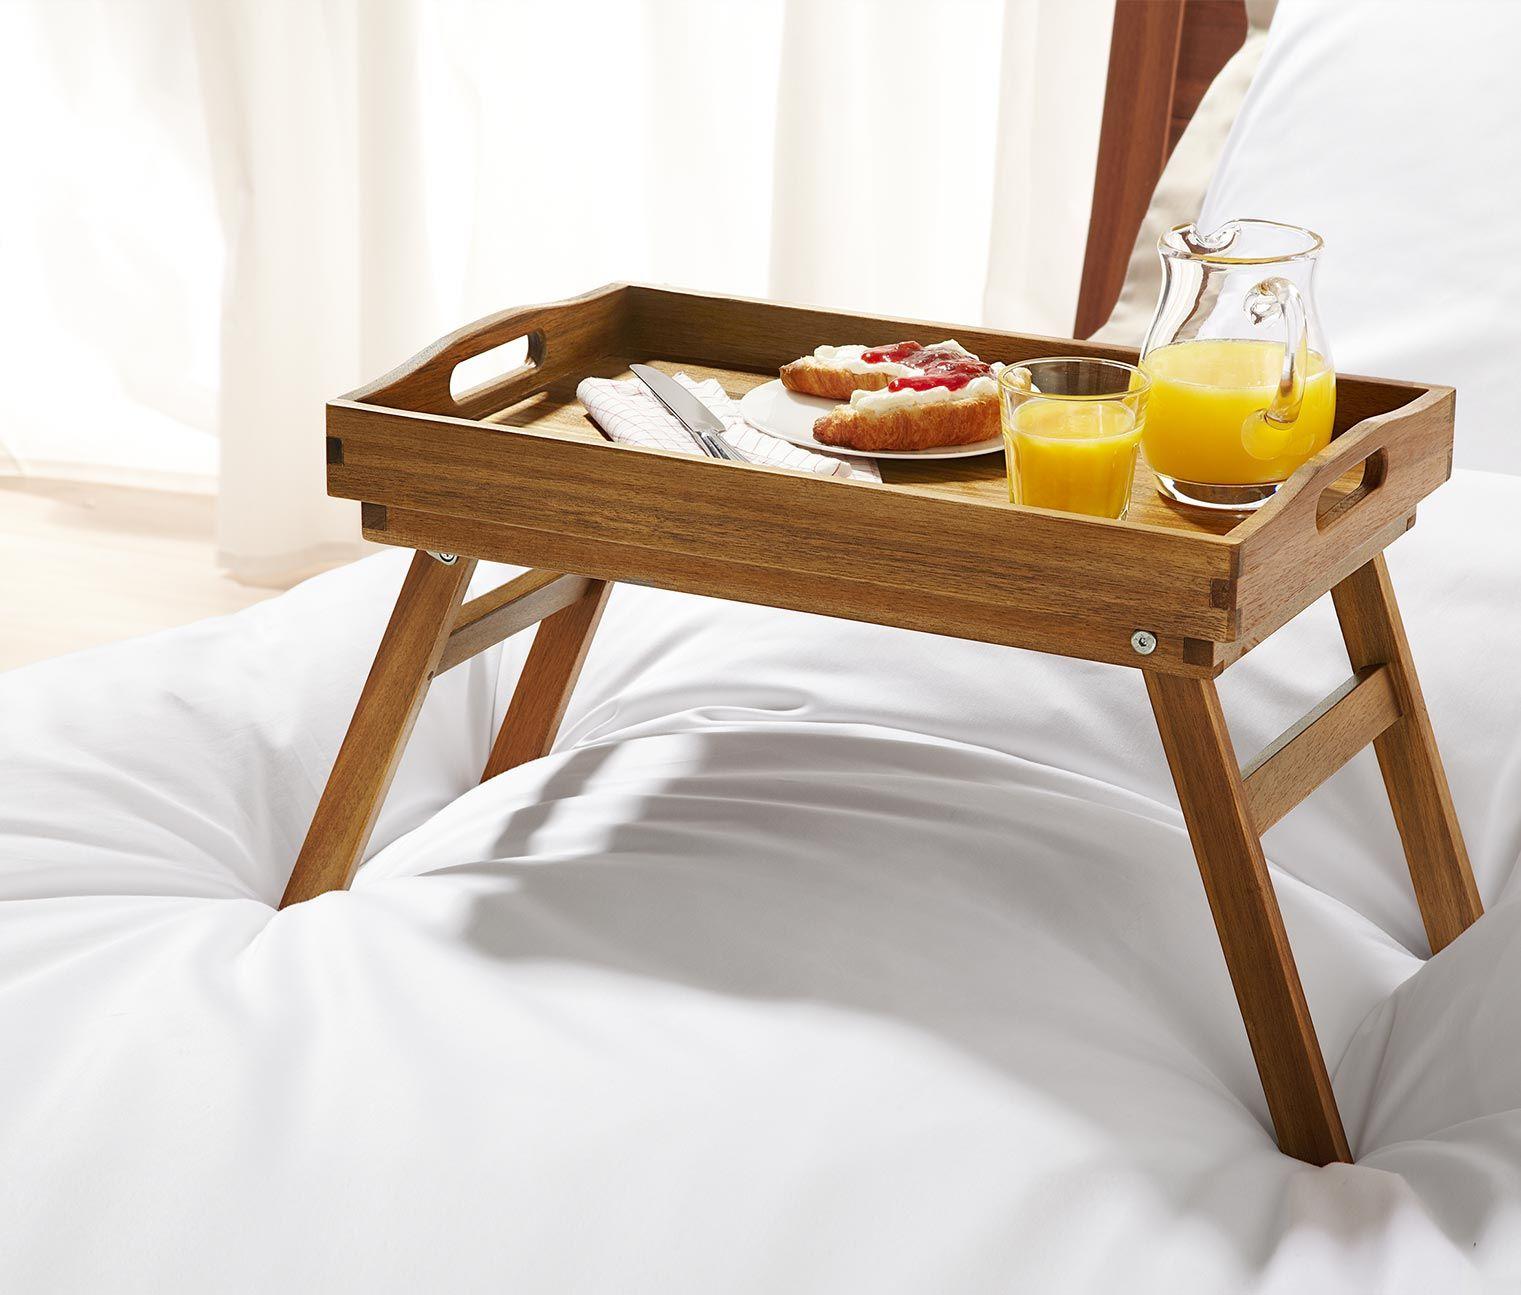 Tablett Tisch Fruhstuck Im Bett Tablett Tisch